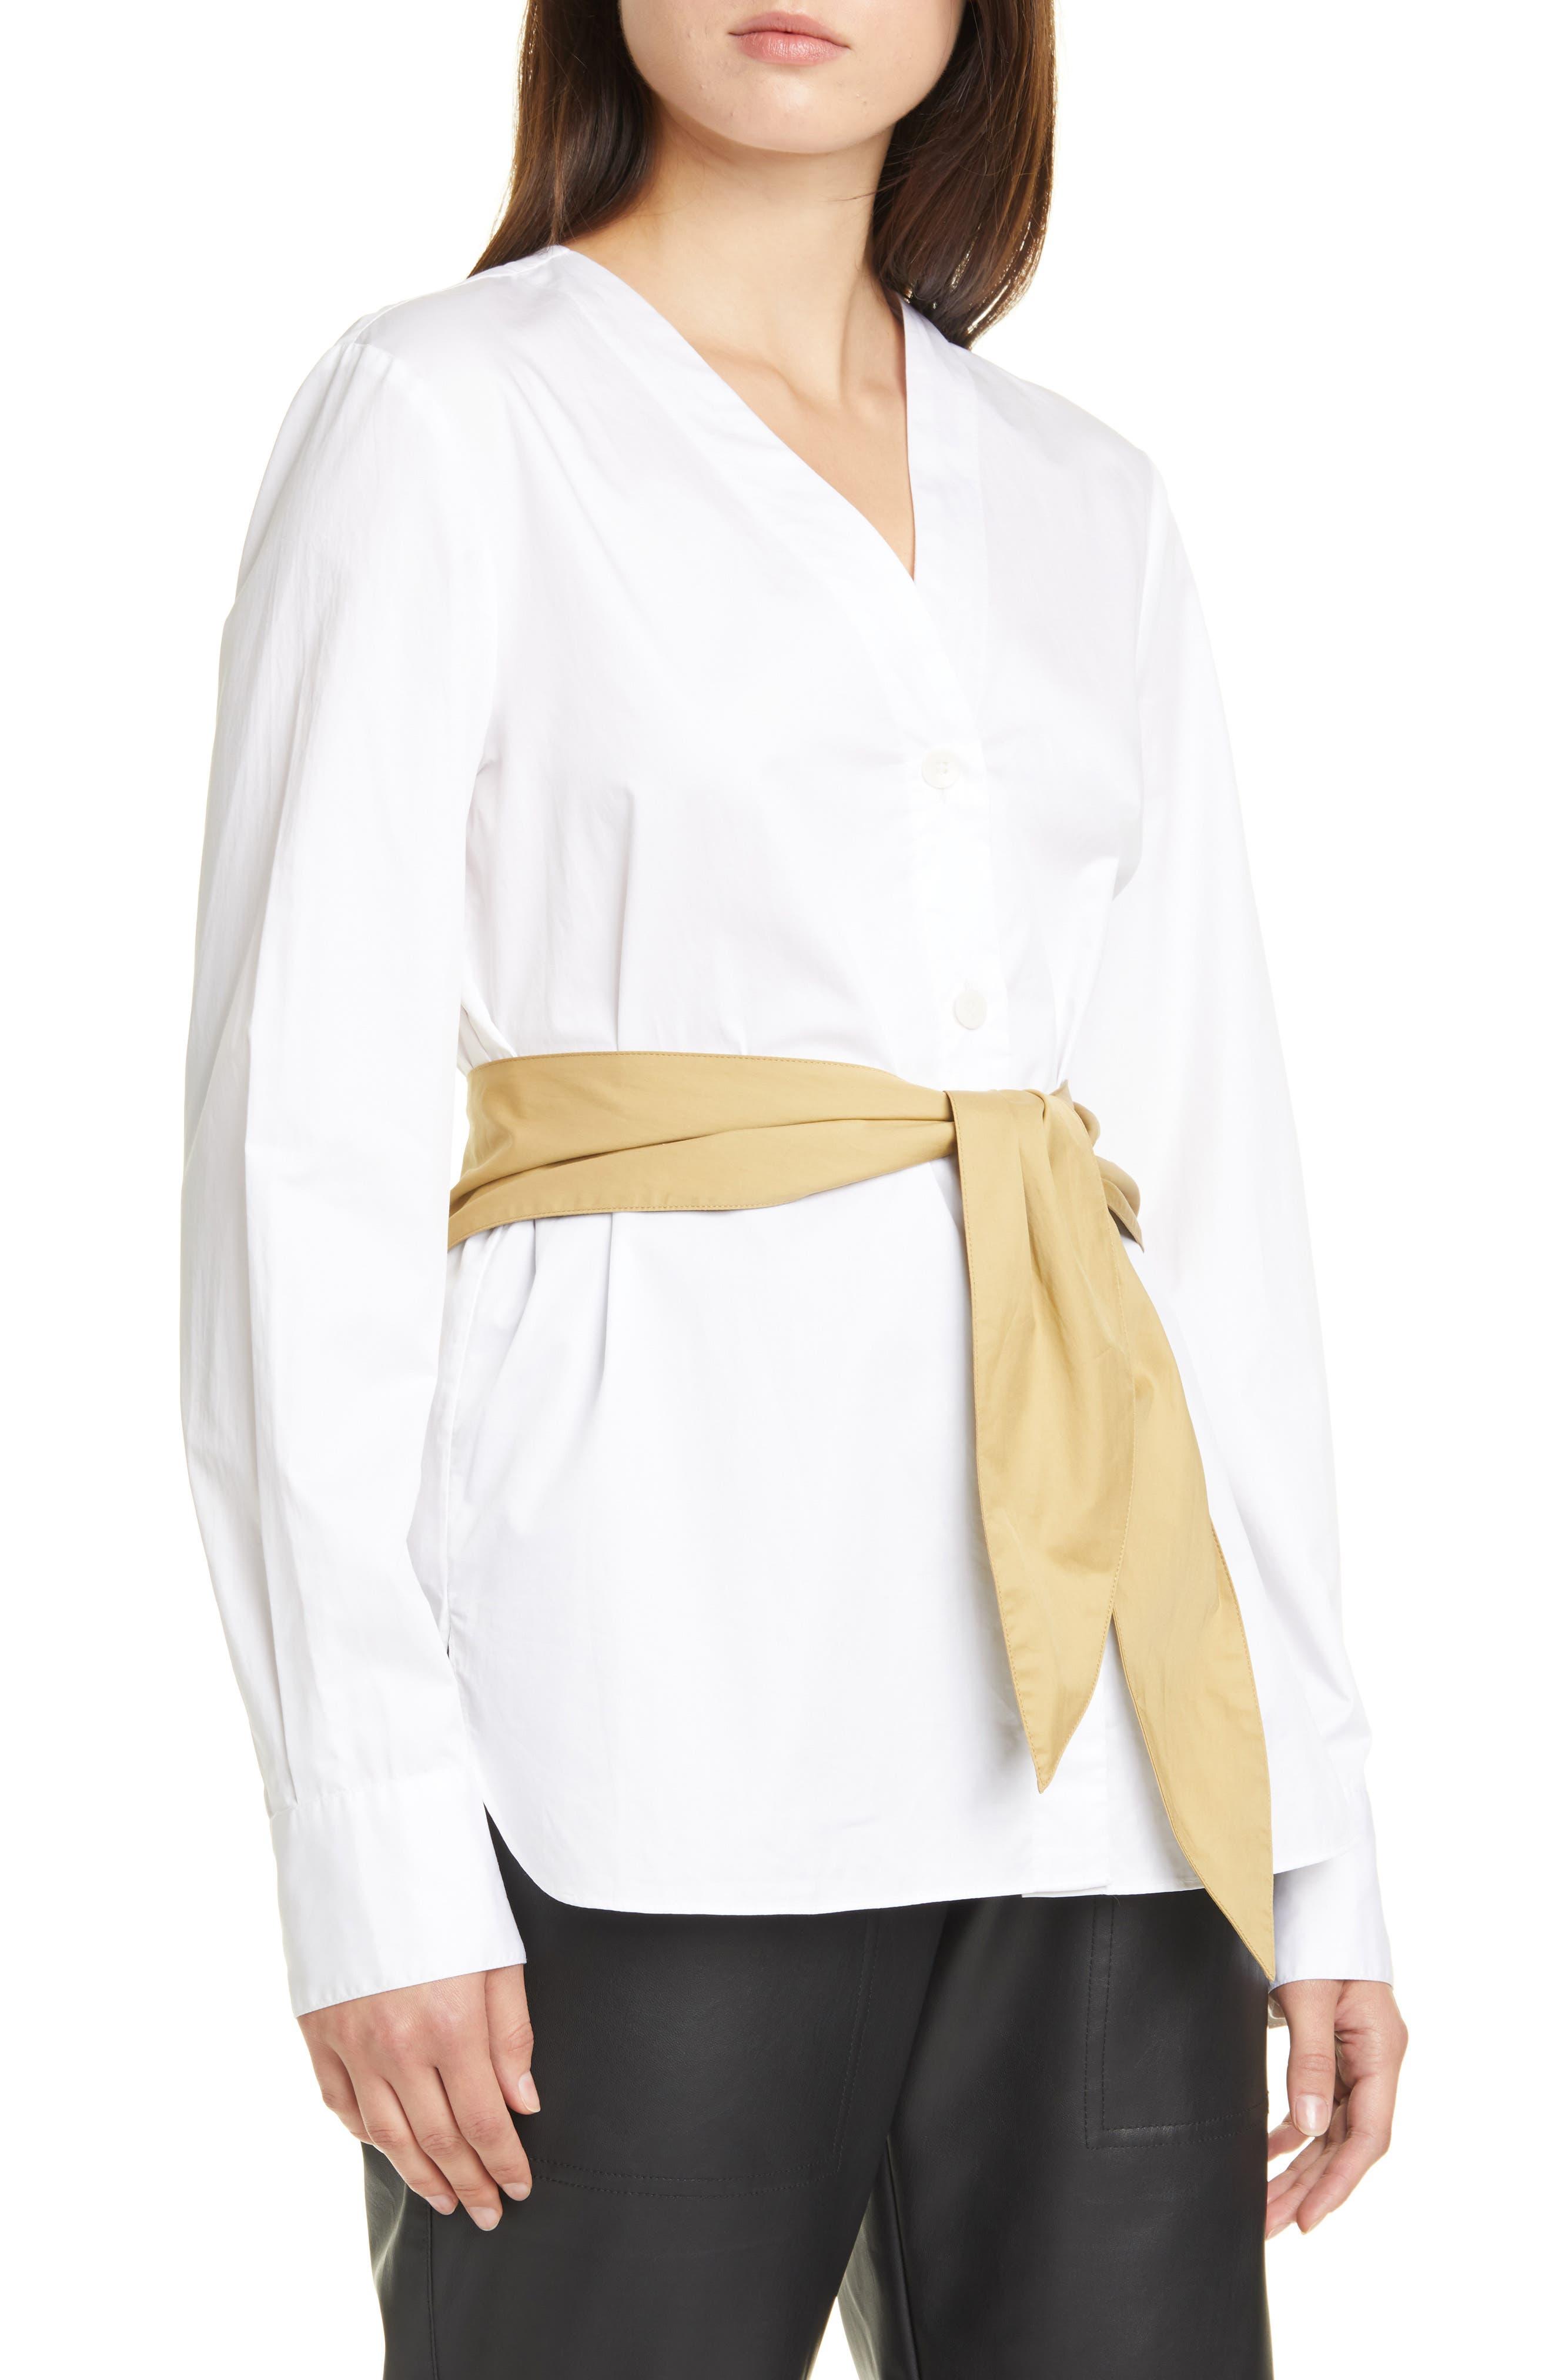 Image of Tibi Cotton Poplin Shirt with Tie Belt